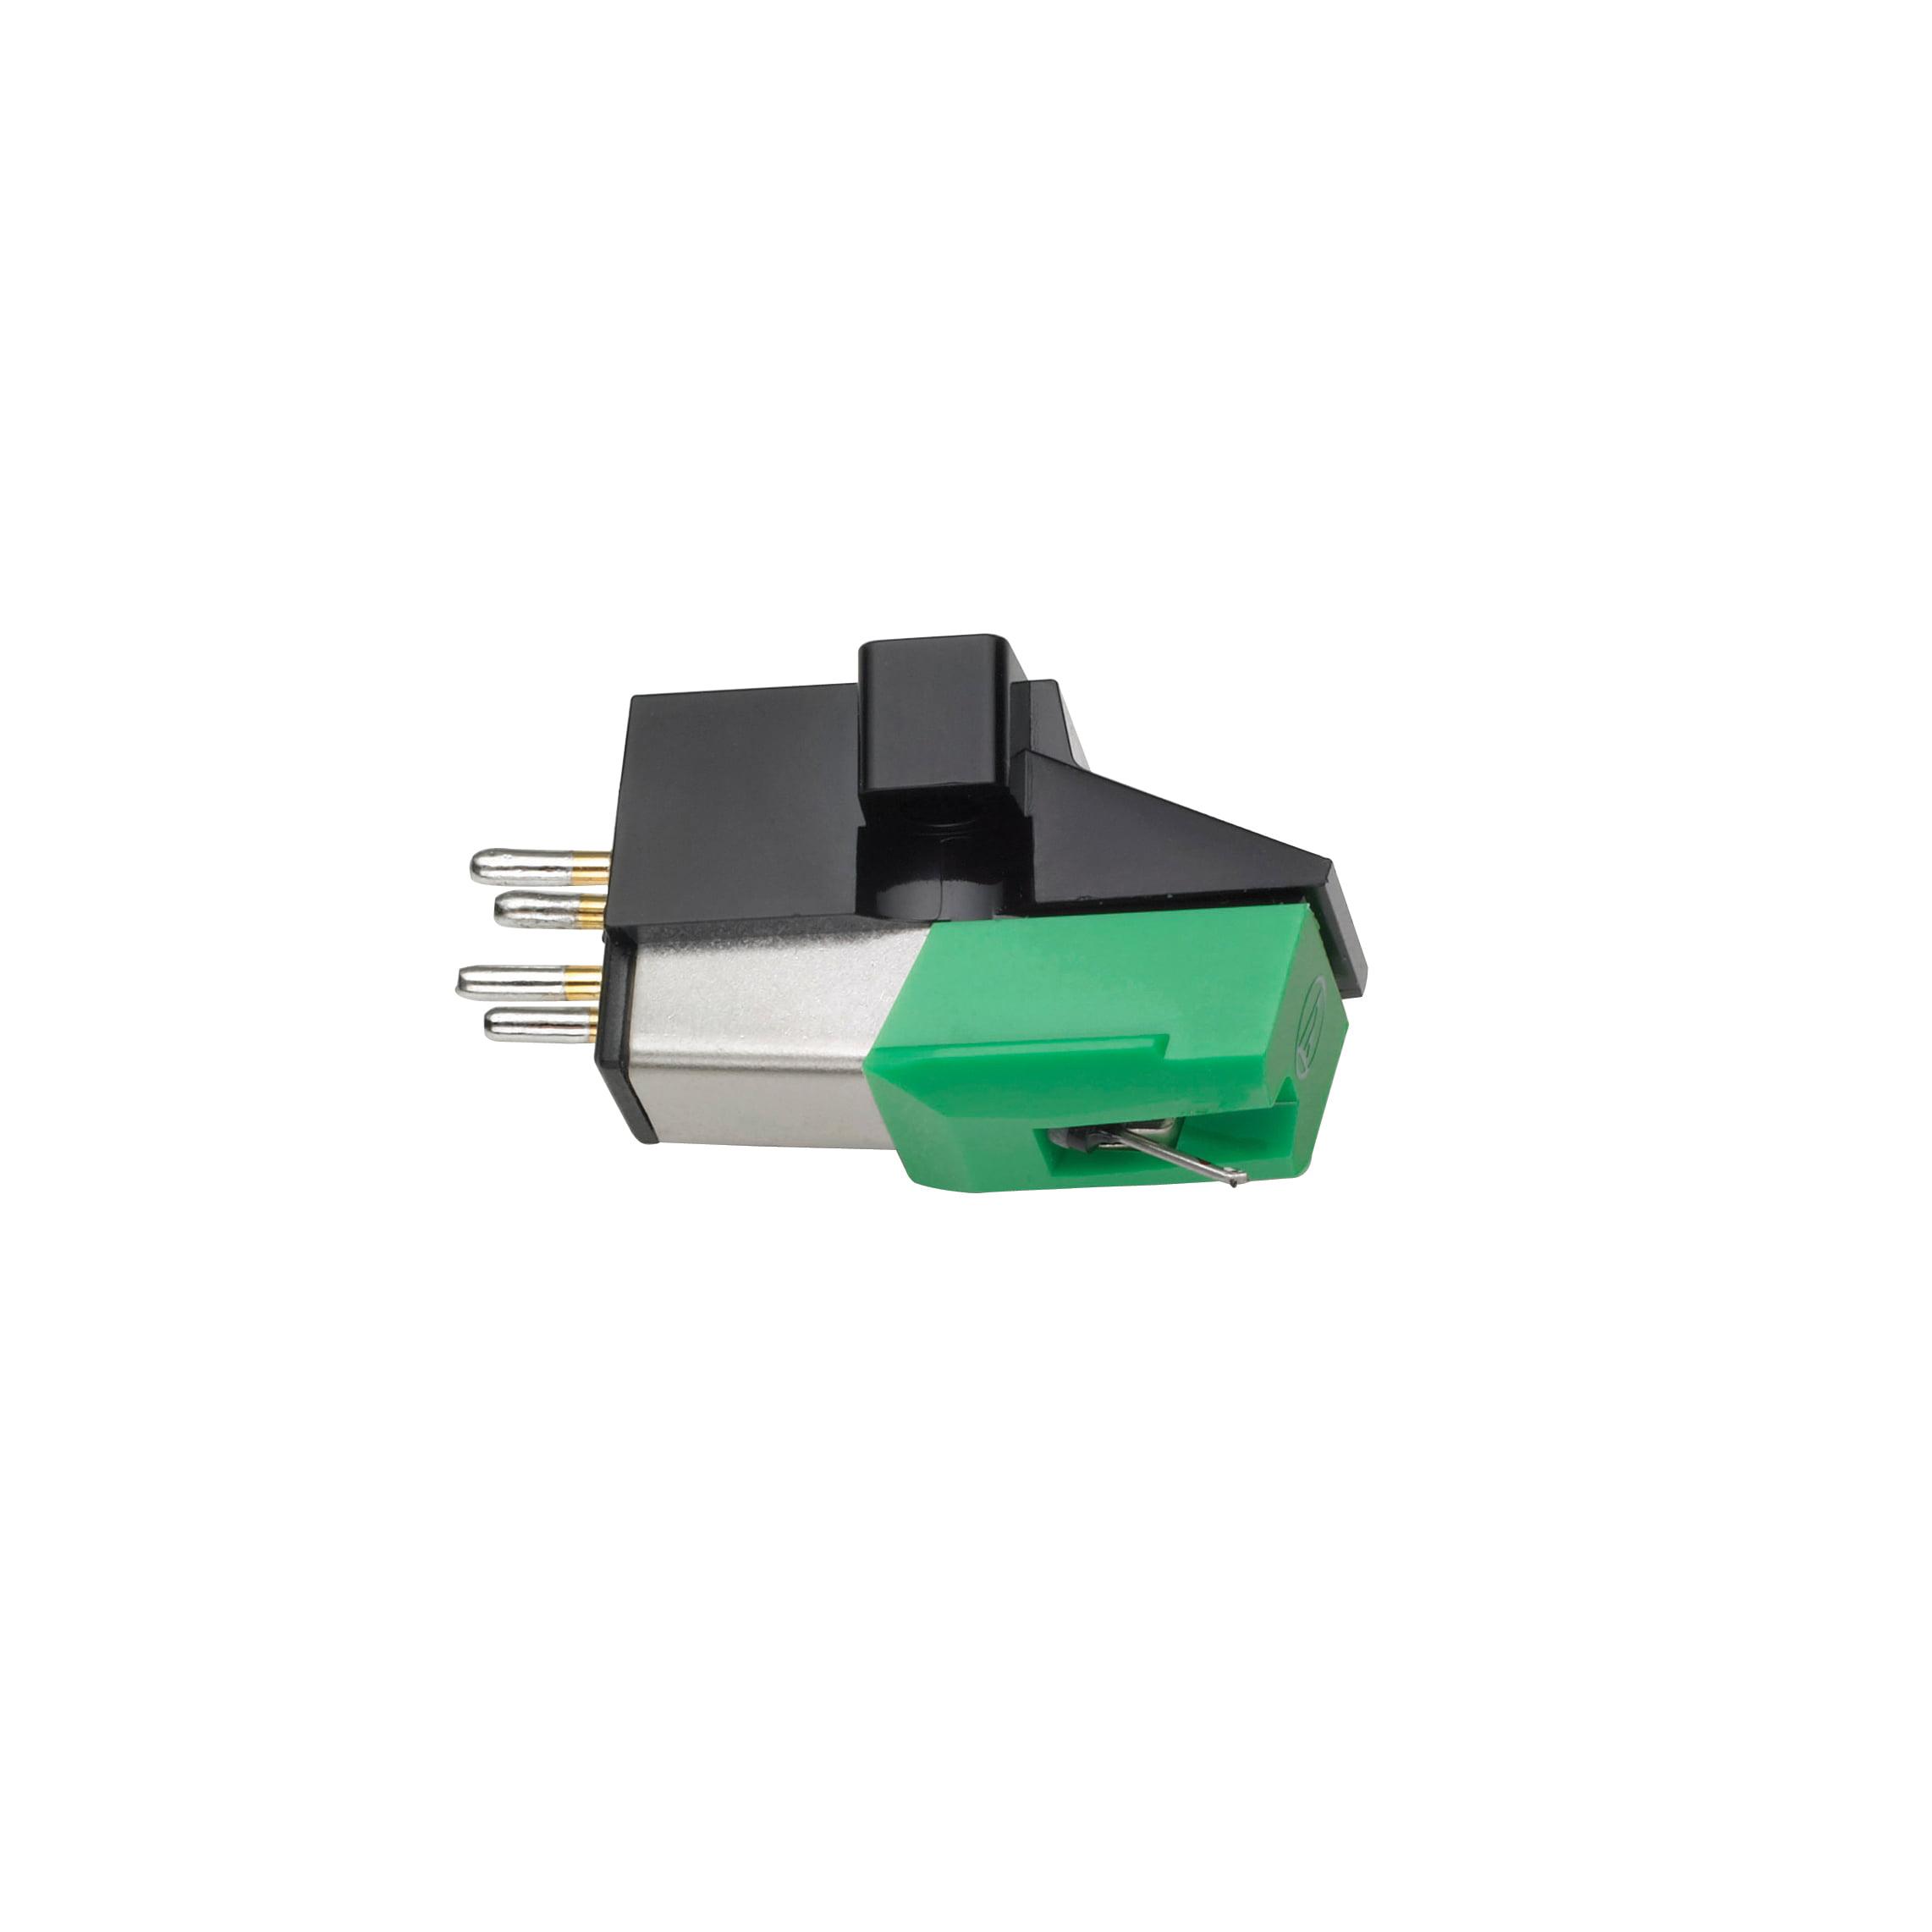 Audio-Technica Dual Magnet Cartridge AT95E by Audio-Technica